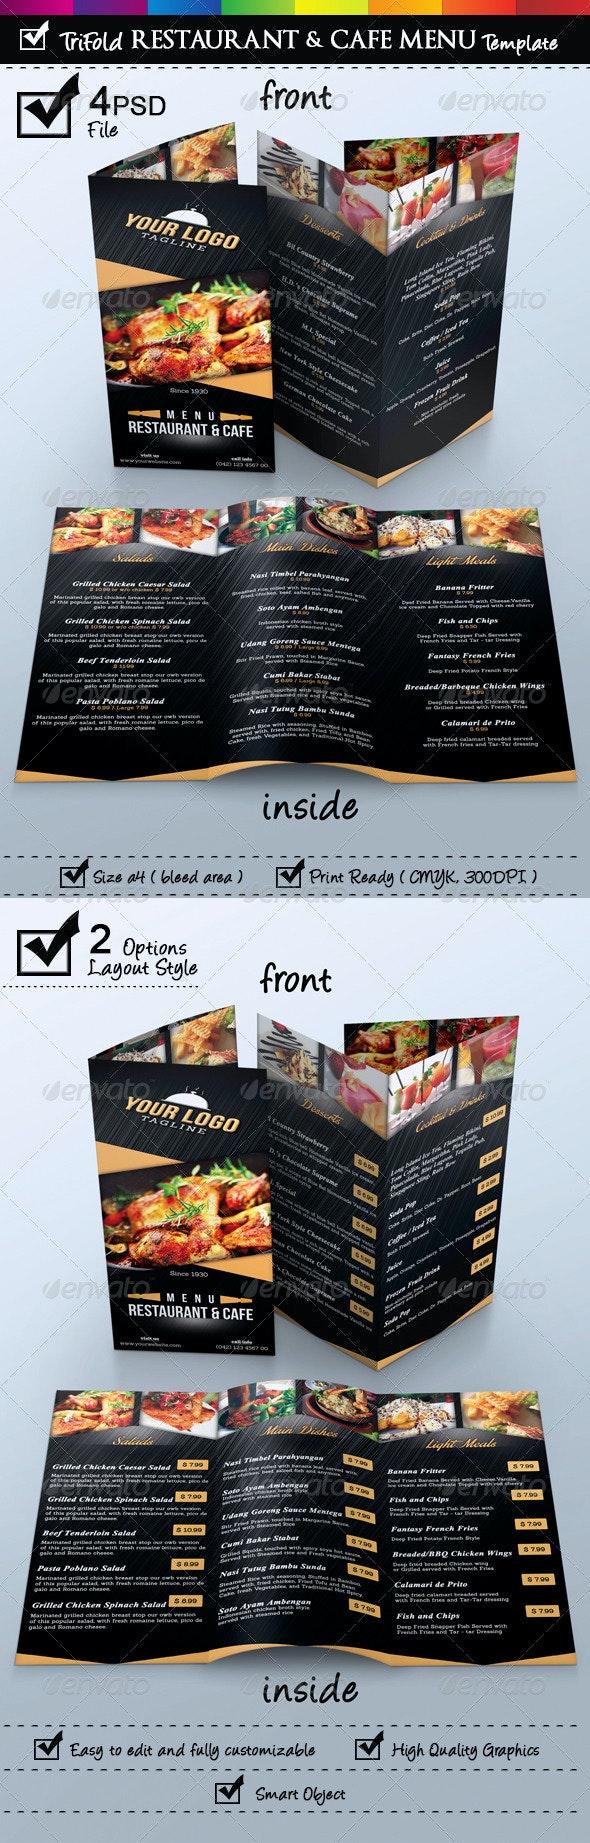 Trifold Restaurant & Cafe Menu Template - Food Menus Print Templates